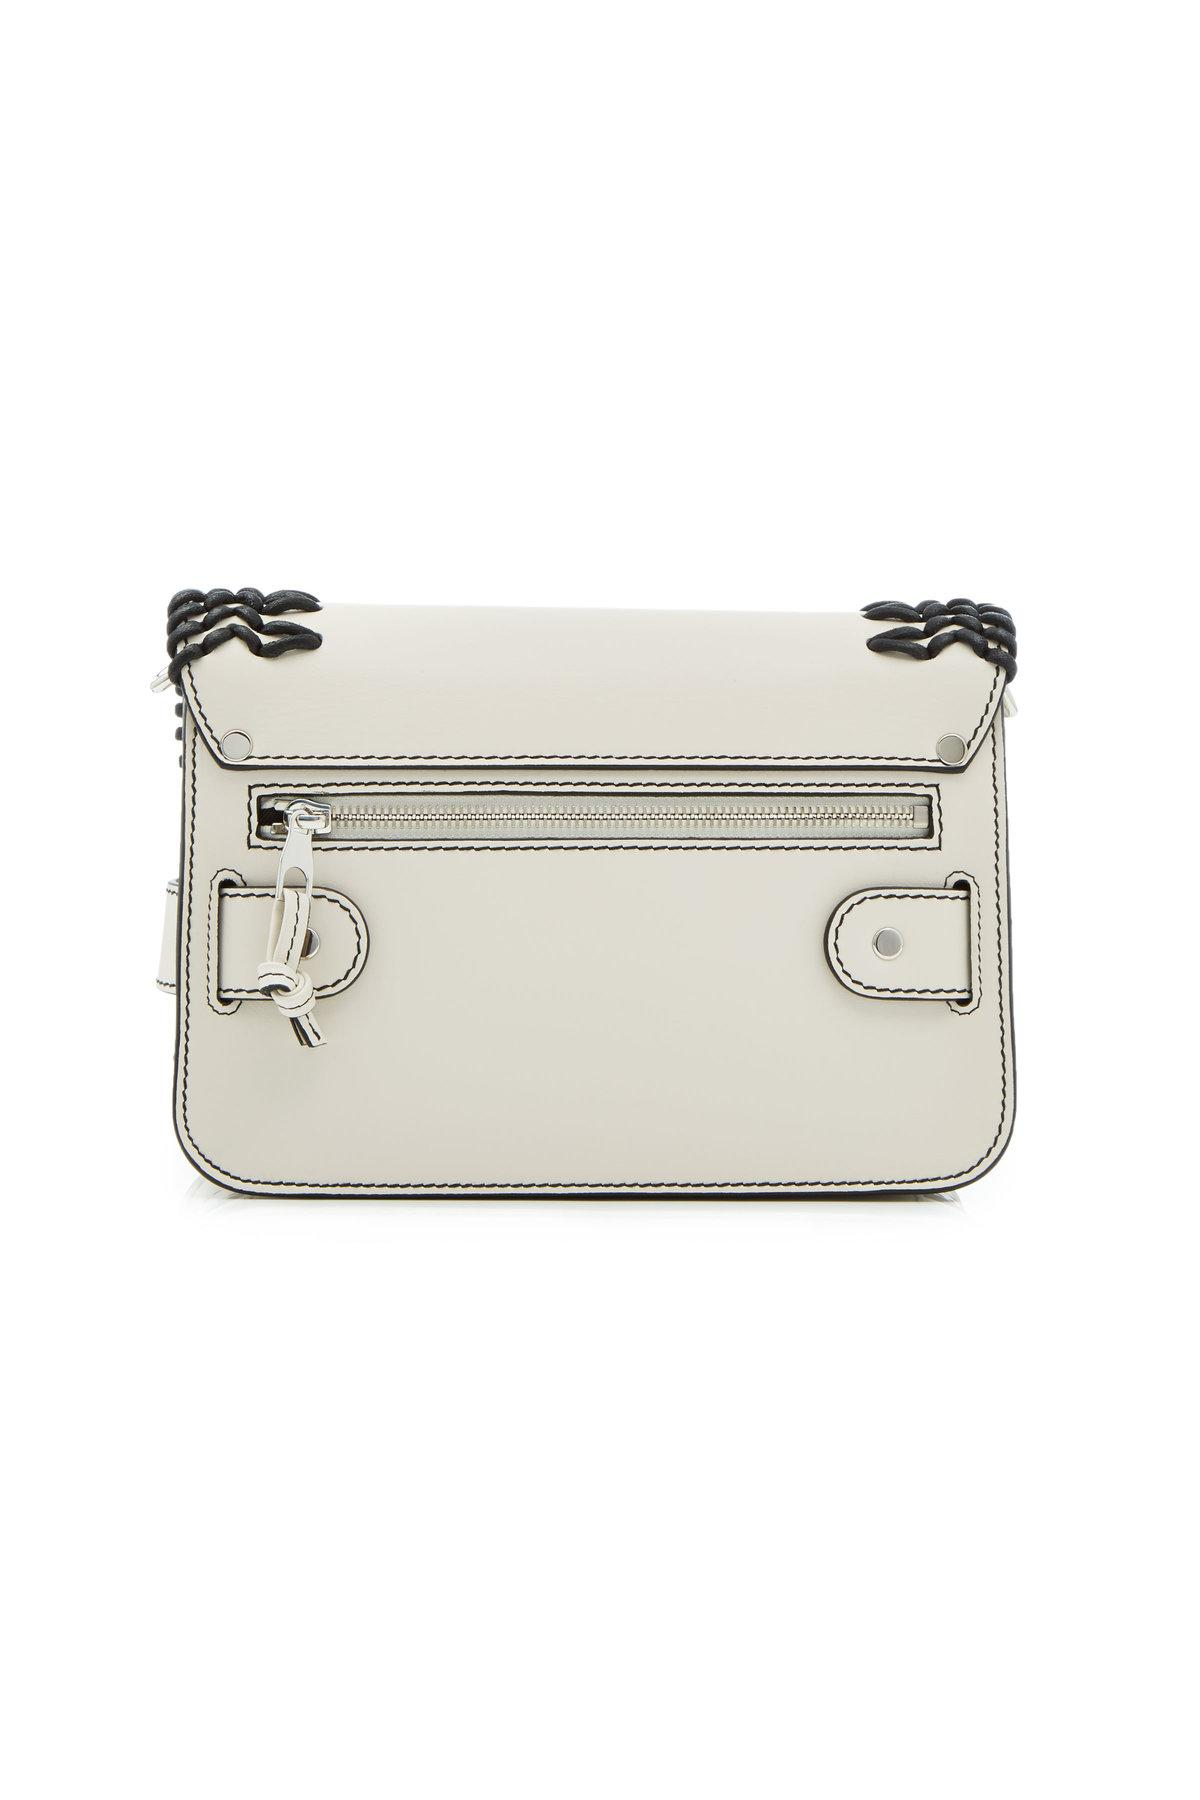 Leather Schouler Classic Shoulder Mini Bag Ps11 Proenza With Lyst wv7qRzW